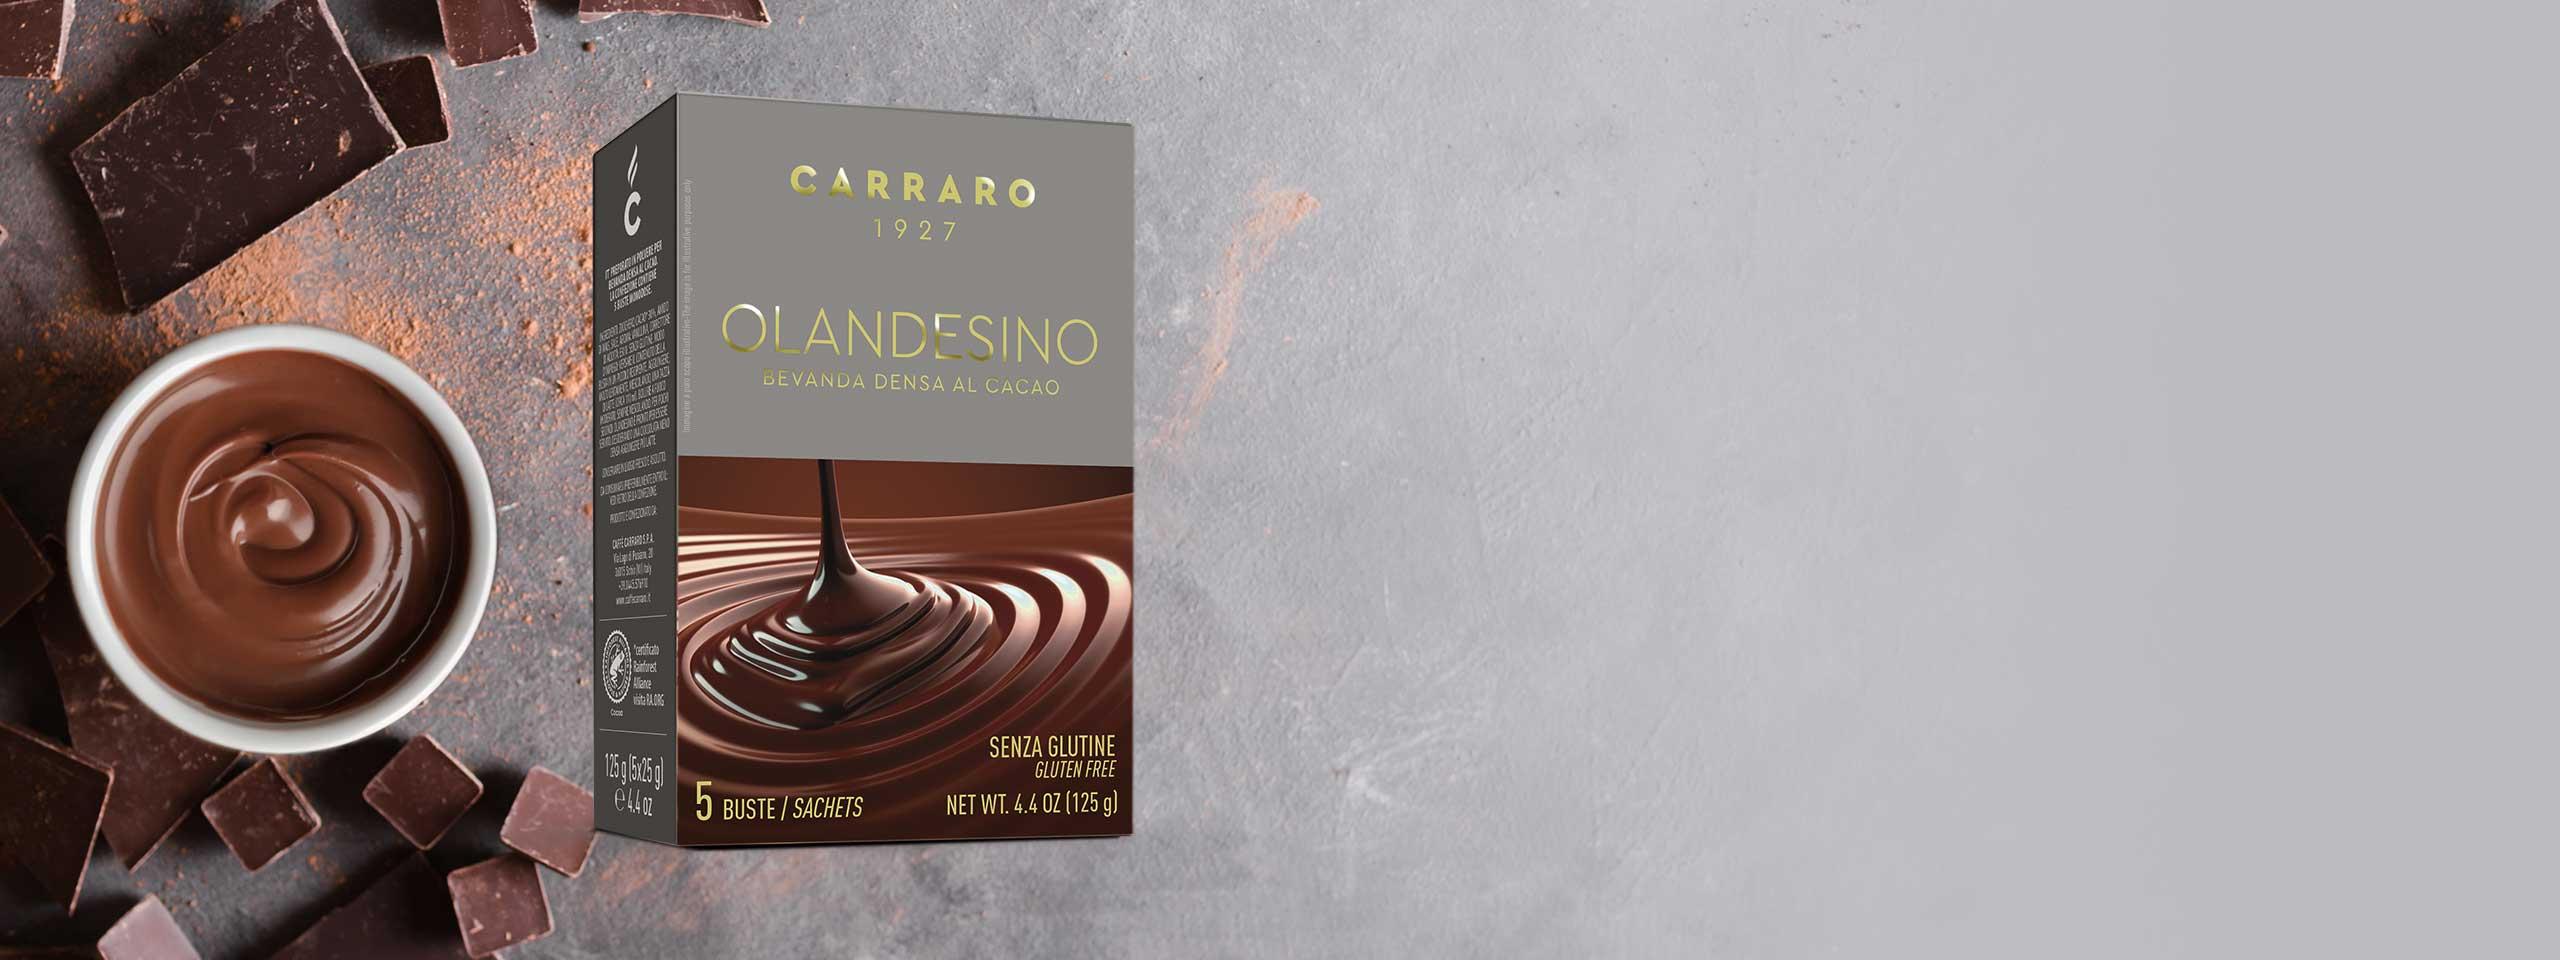 Olandesino – box with 5 bags 25 g each